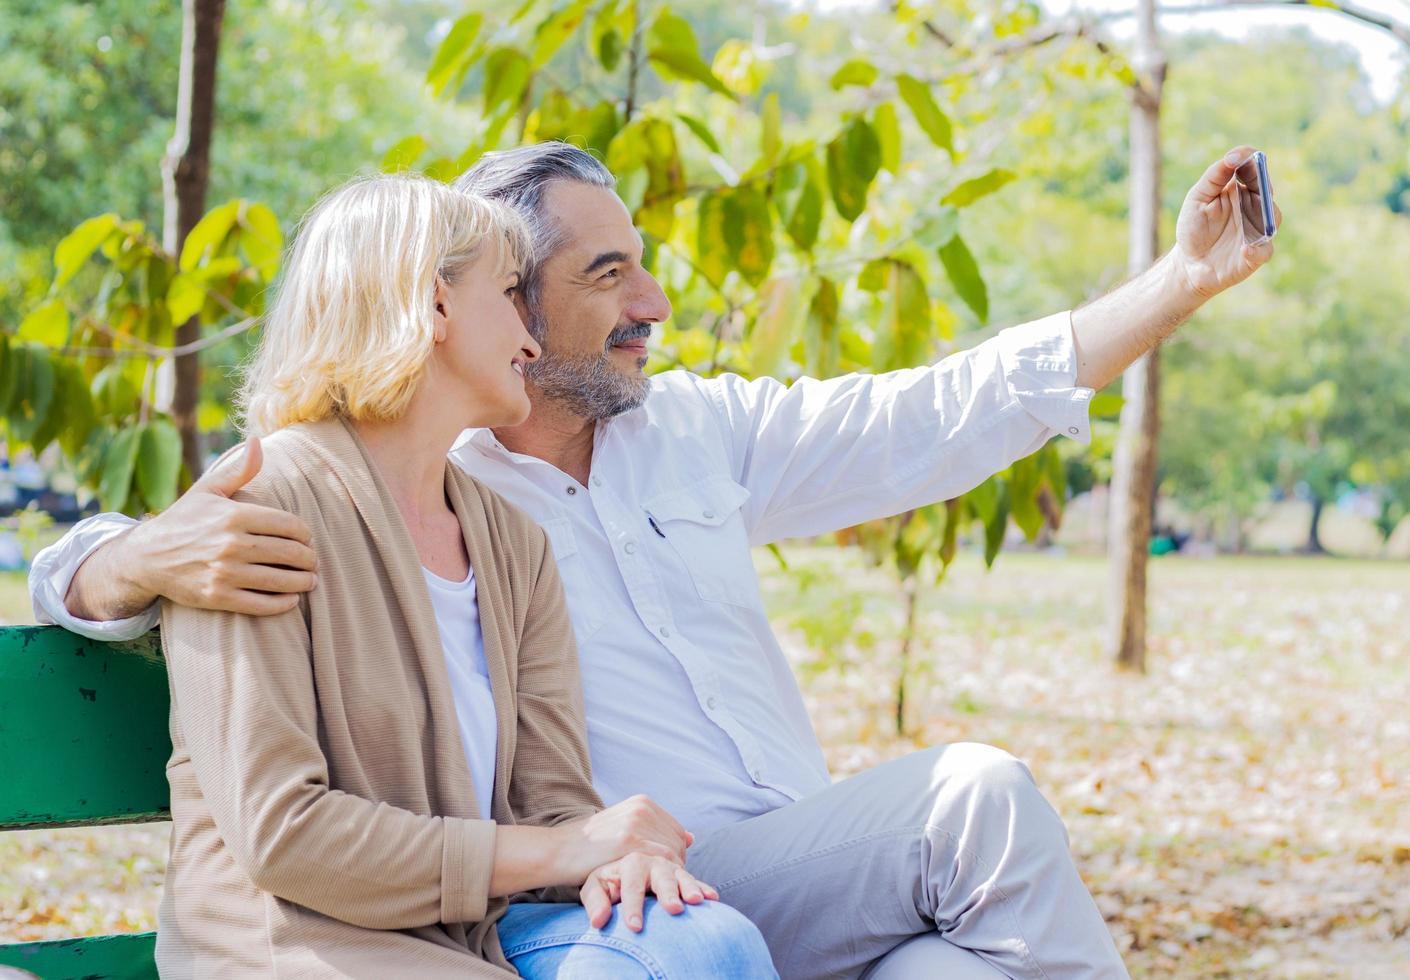 coppia che cattura selfie in un parco foto